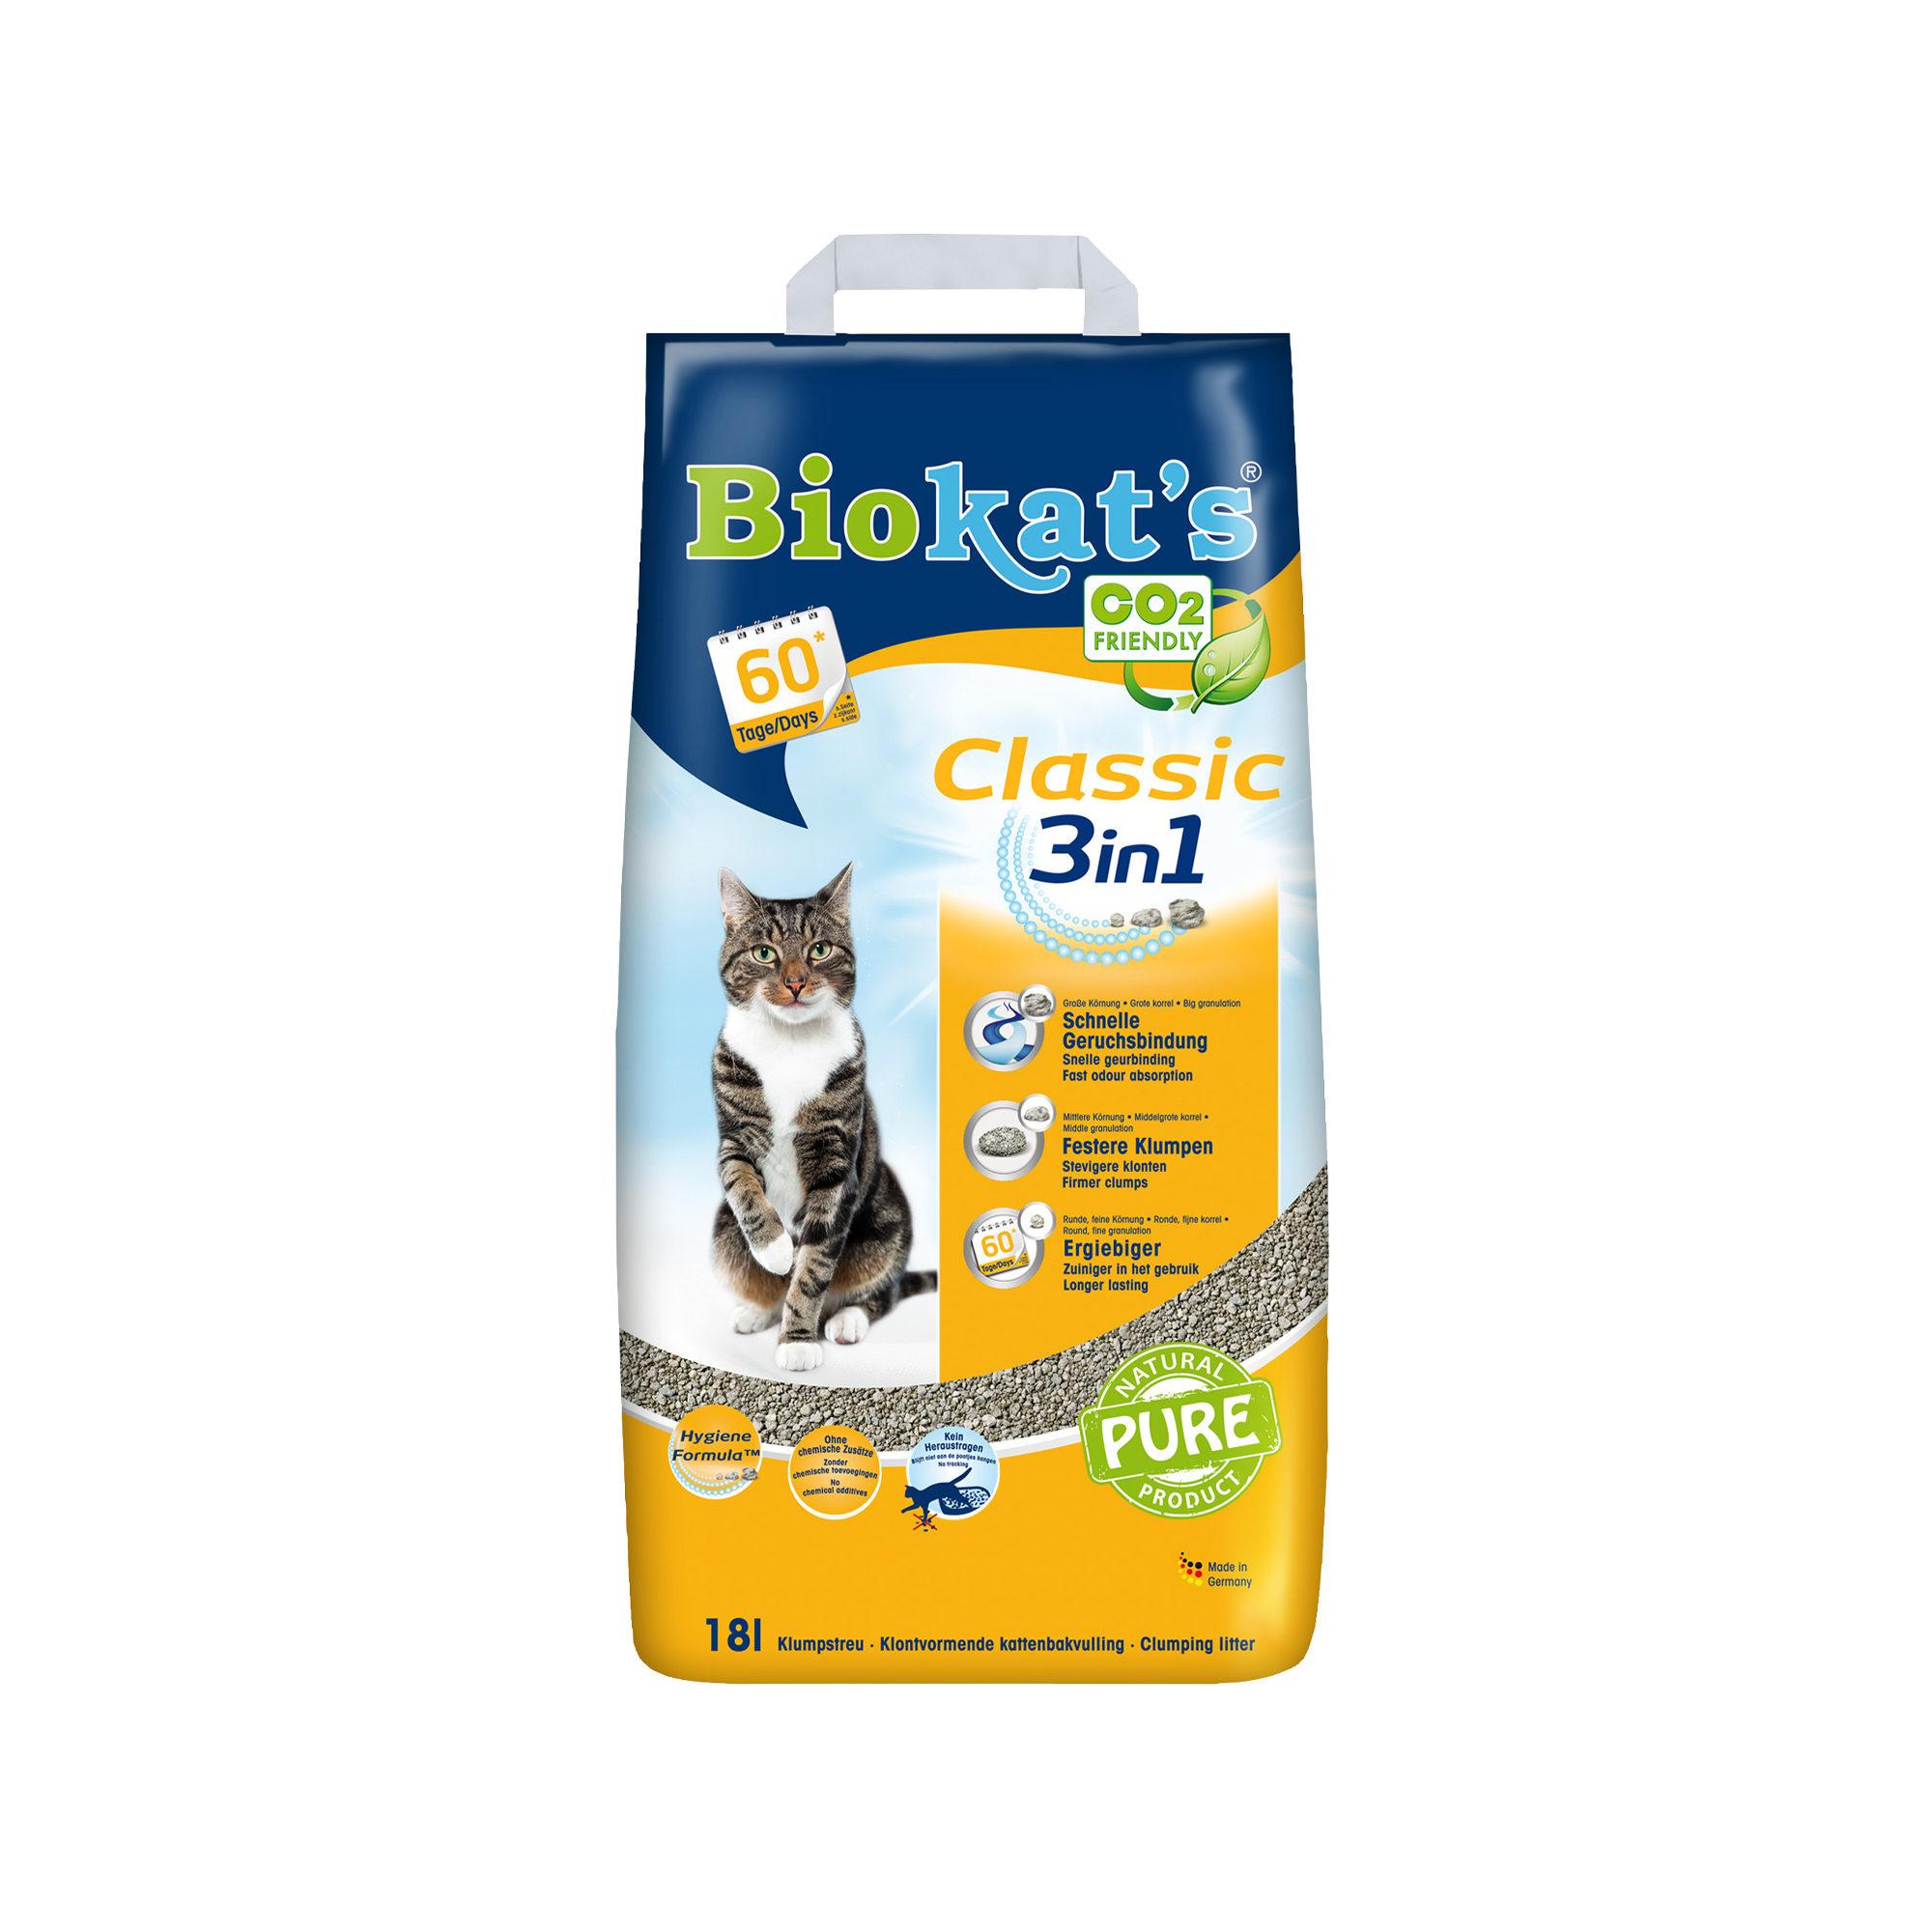 Biokat's Classic 3in2 - 18 L